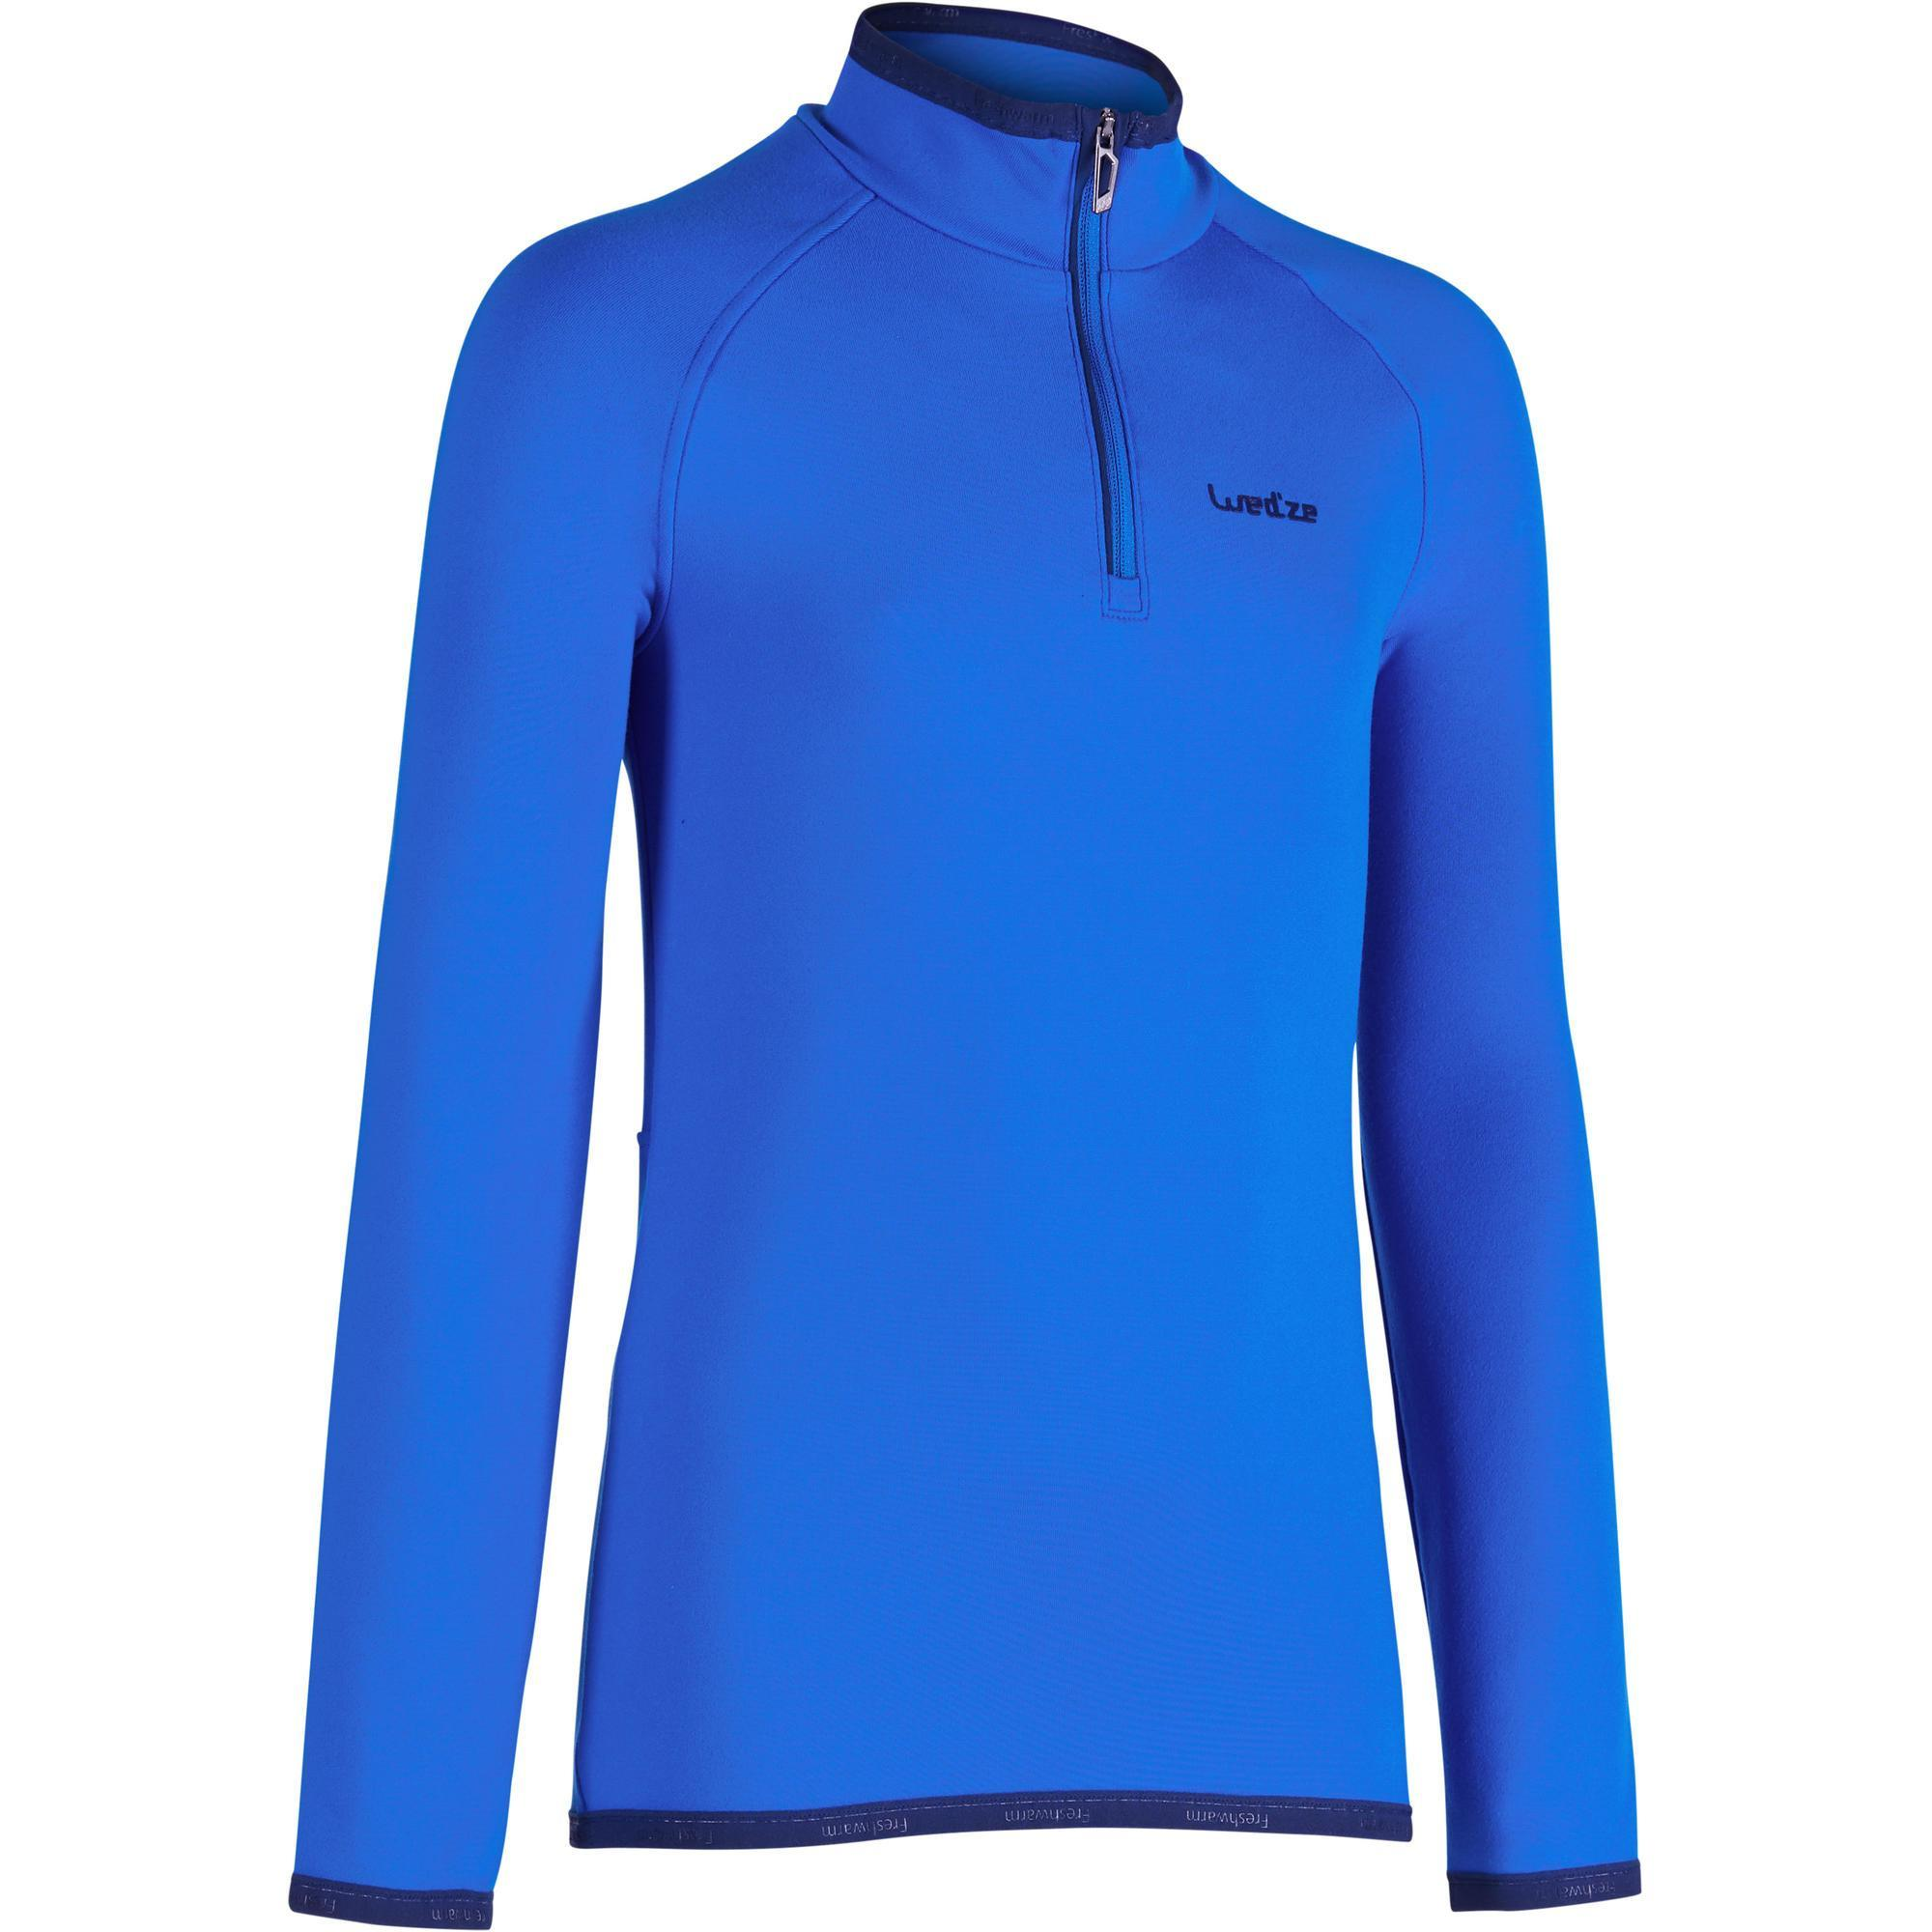 742292b06dcbe1 Onderkleding online kopen? | Via skishop 4u = de wintersport & ski ...